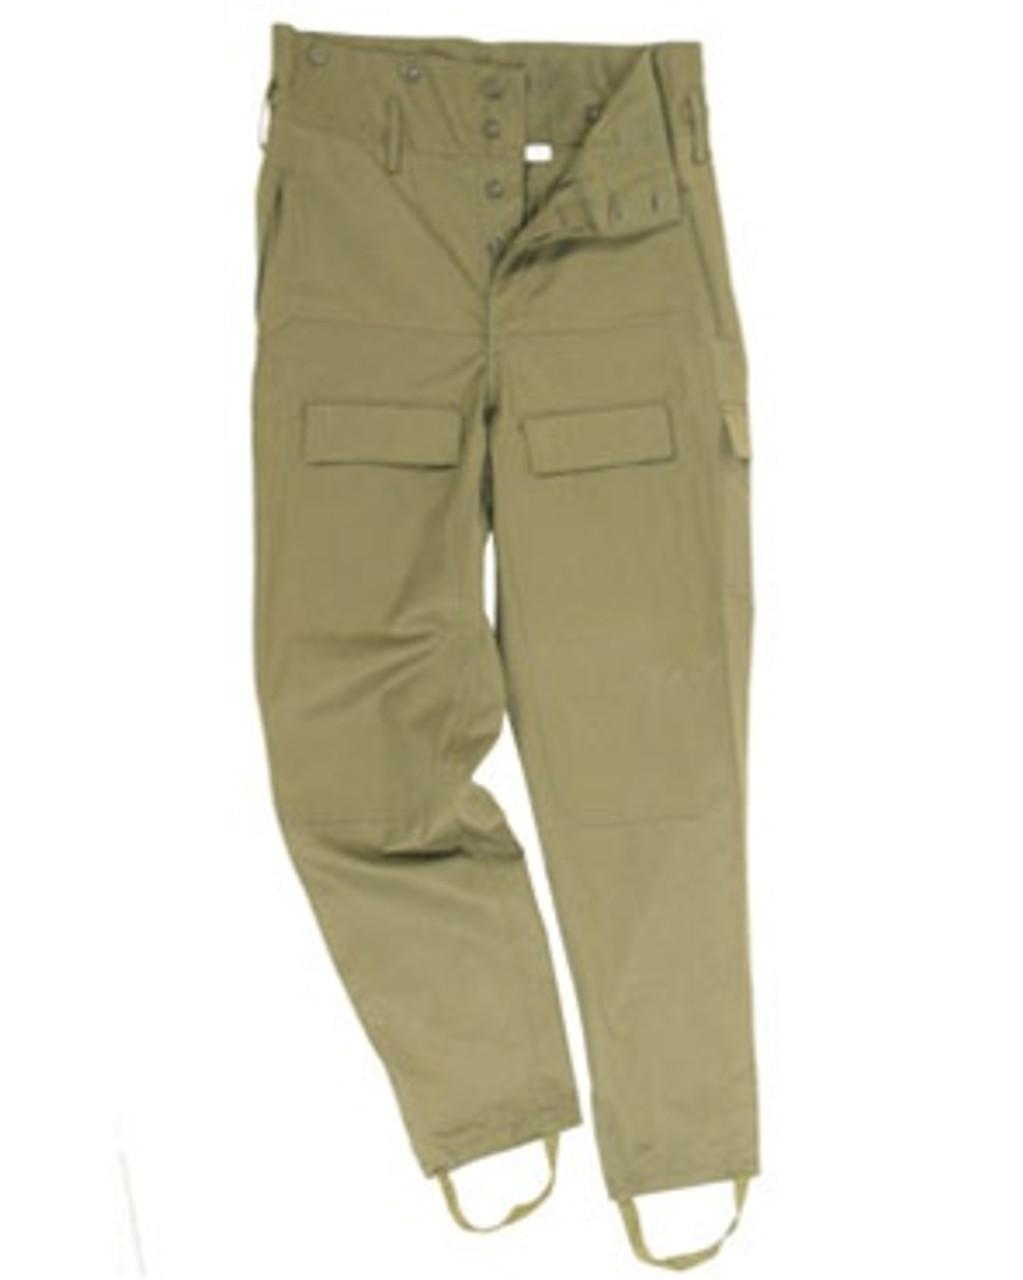 Czech OD M85 Field Pants - Used from Hessen Antique